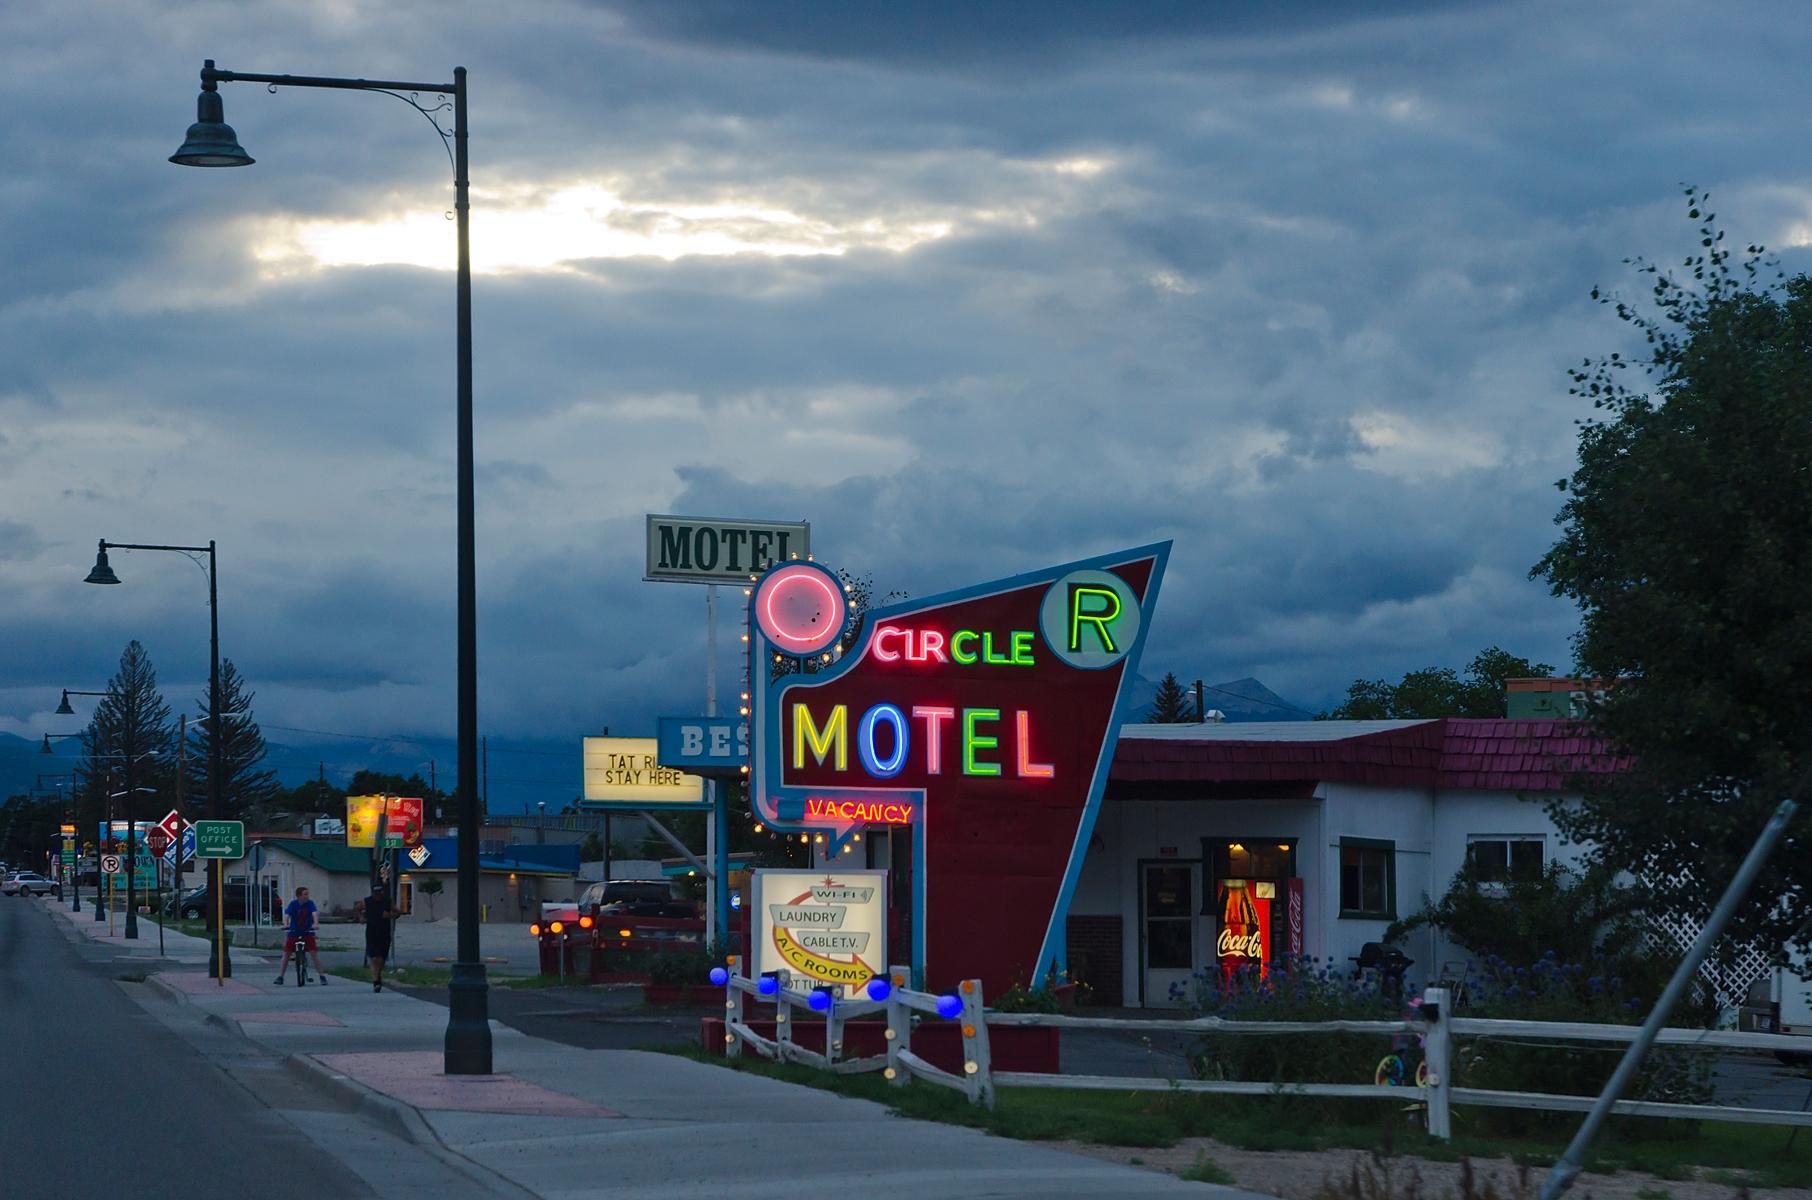 Circle_R_Motel_Salida_Colorado_20130801.jpg